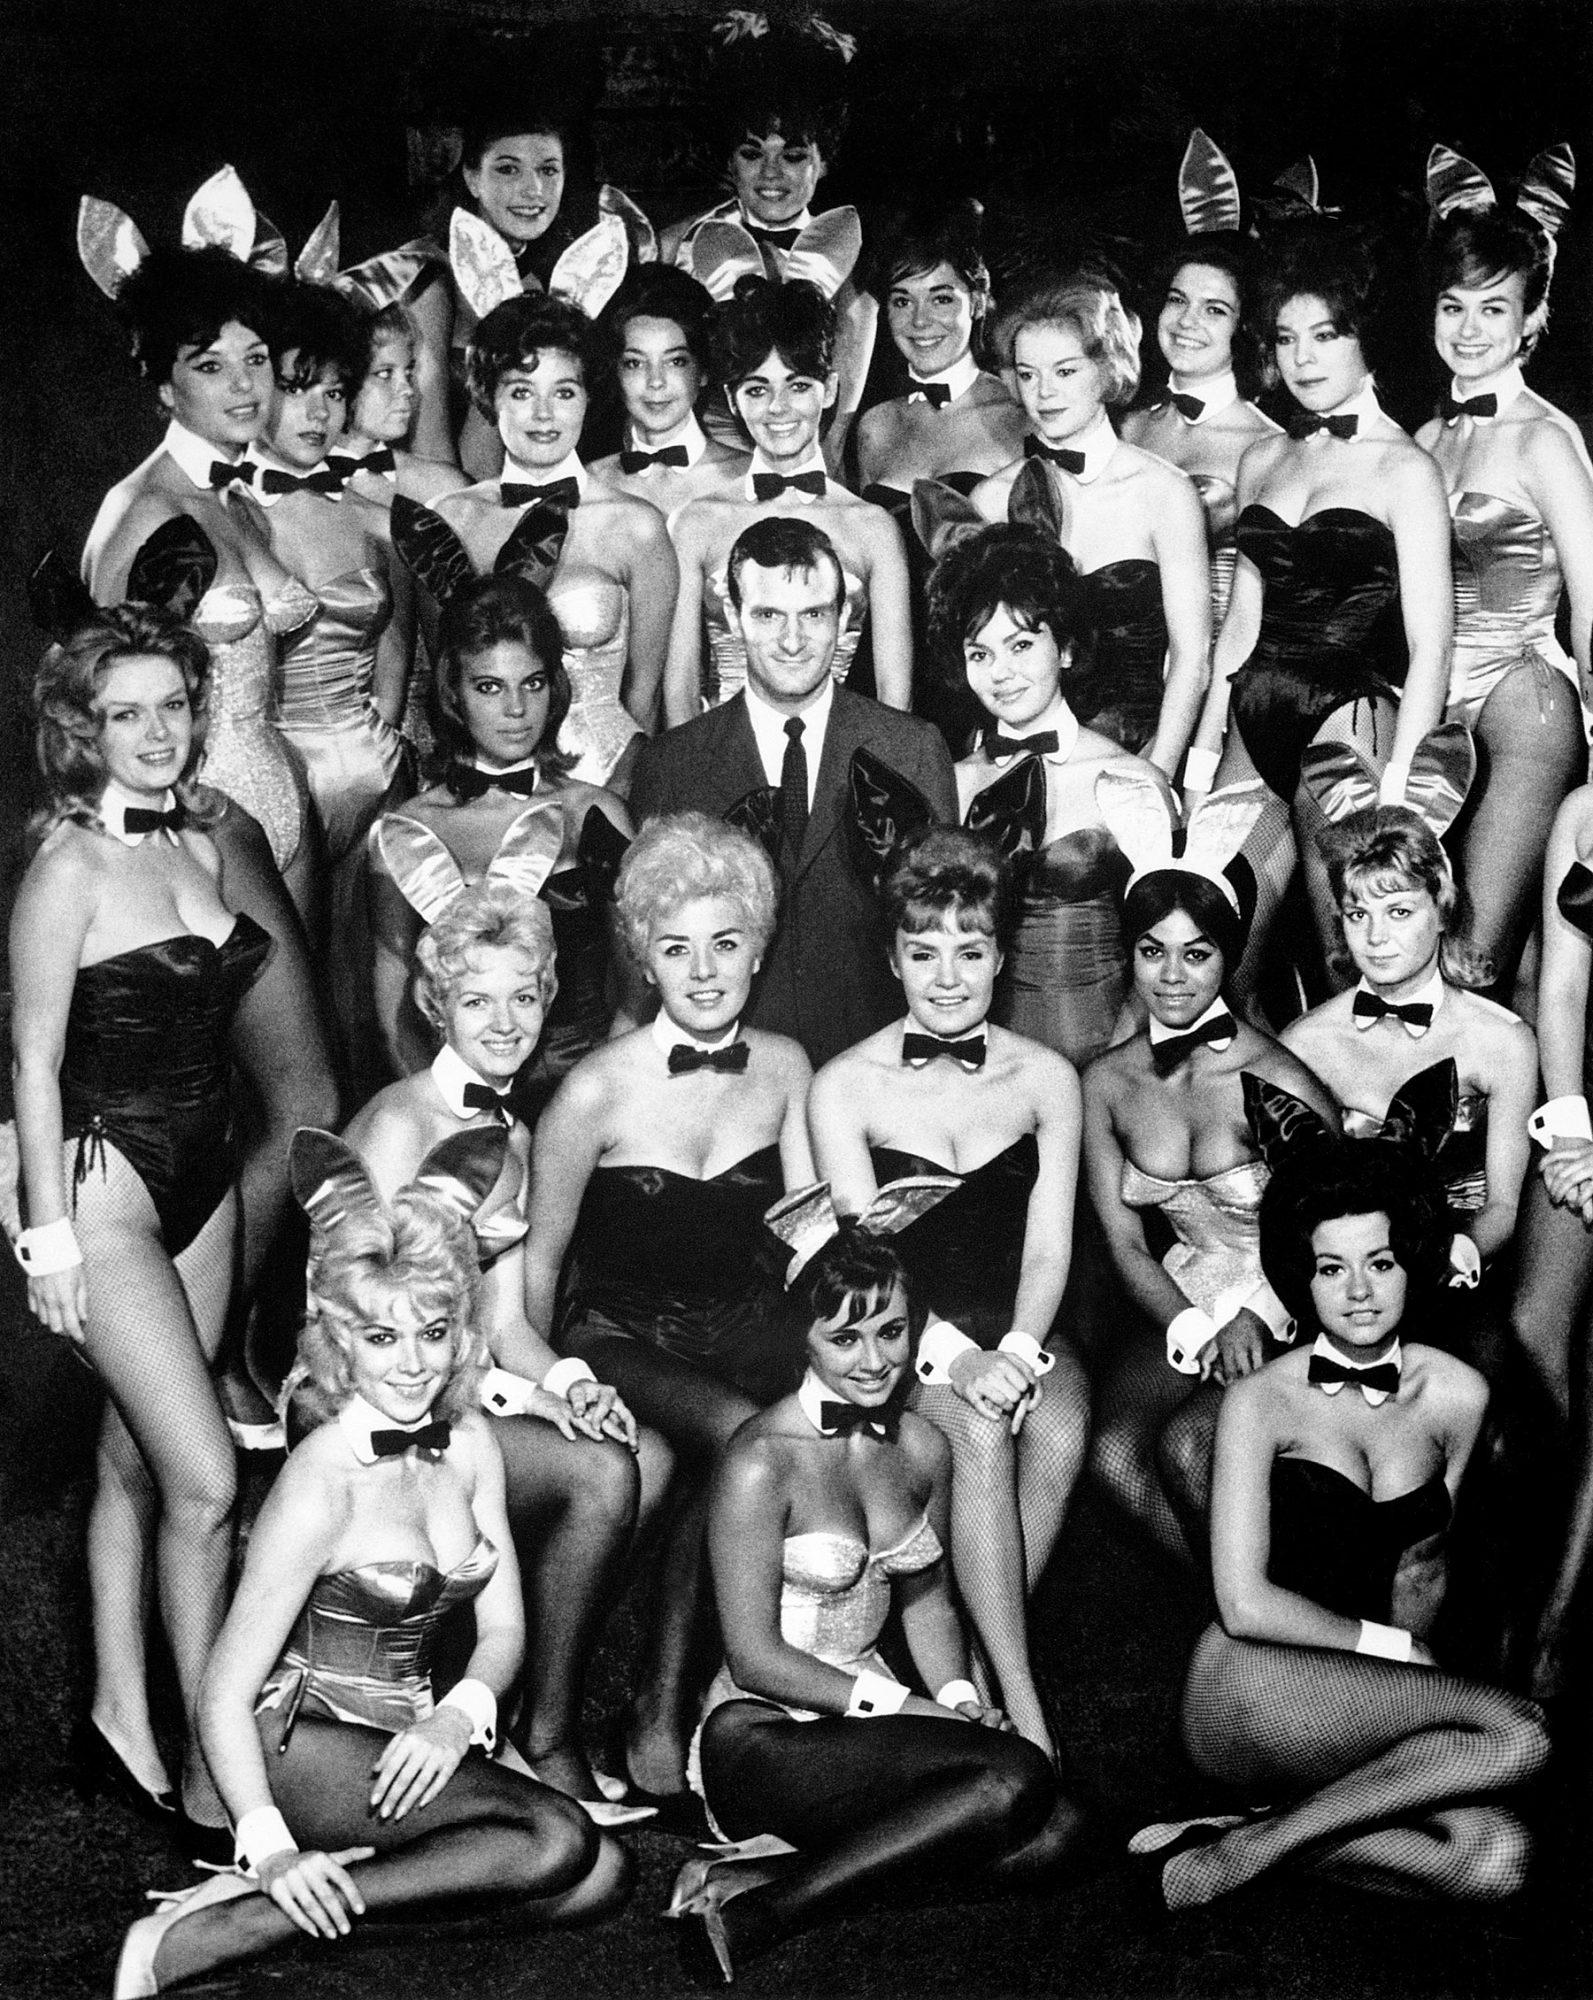 Hugh Hefner Surrounded by Playboy Bunnies